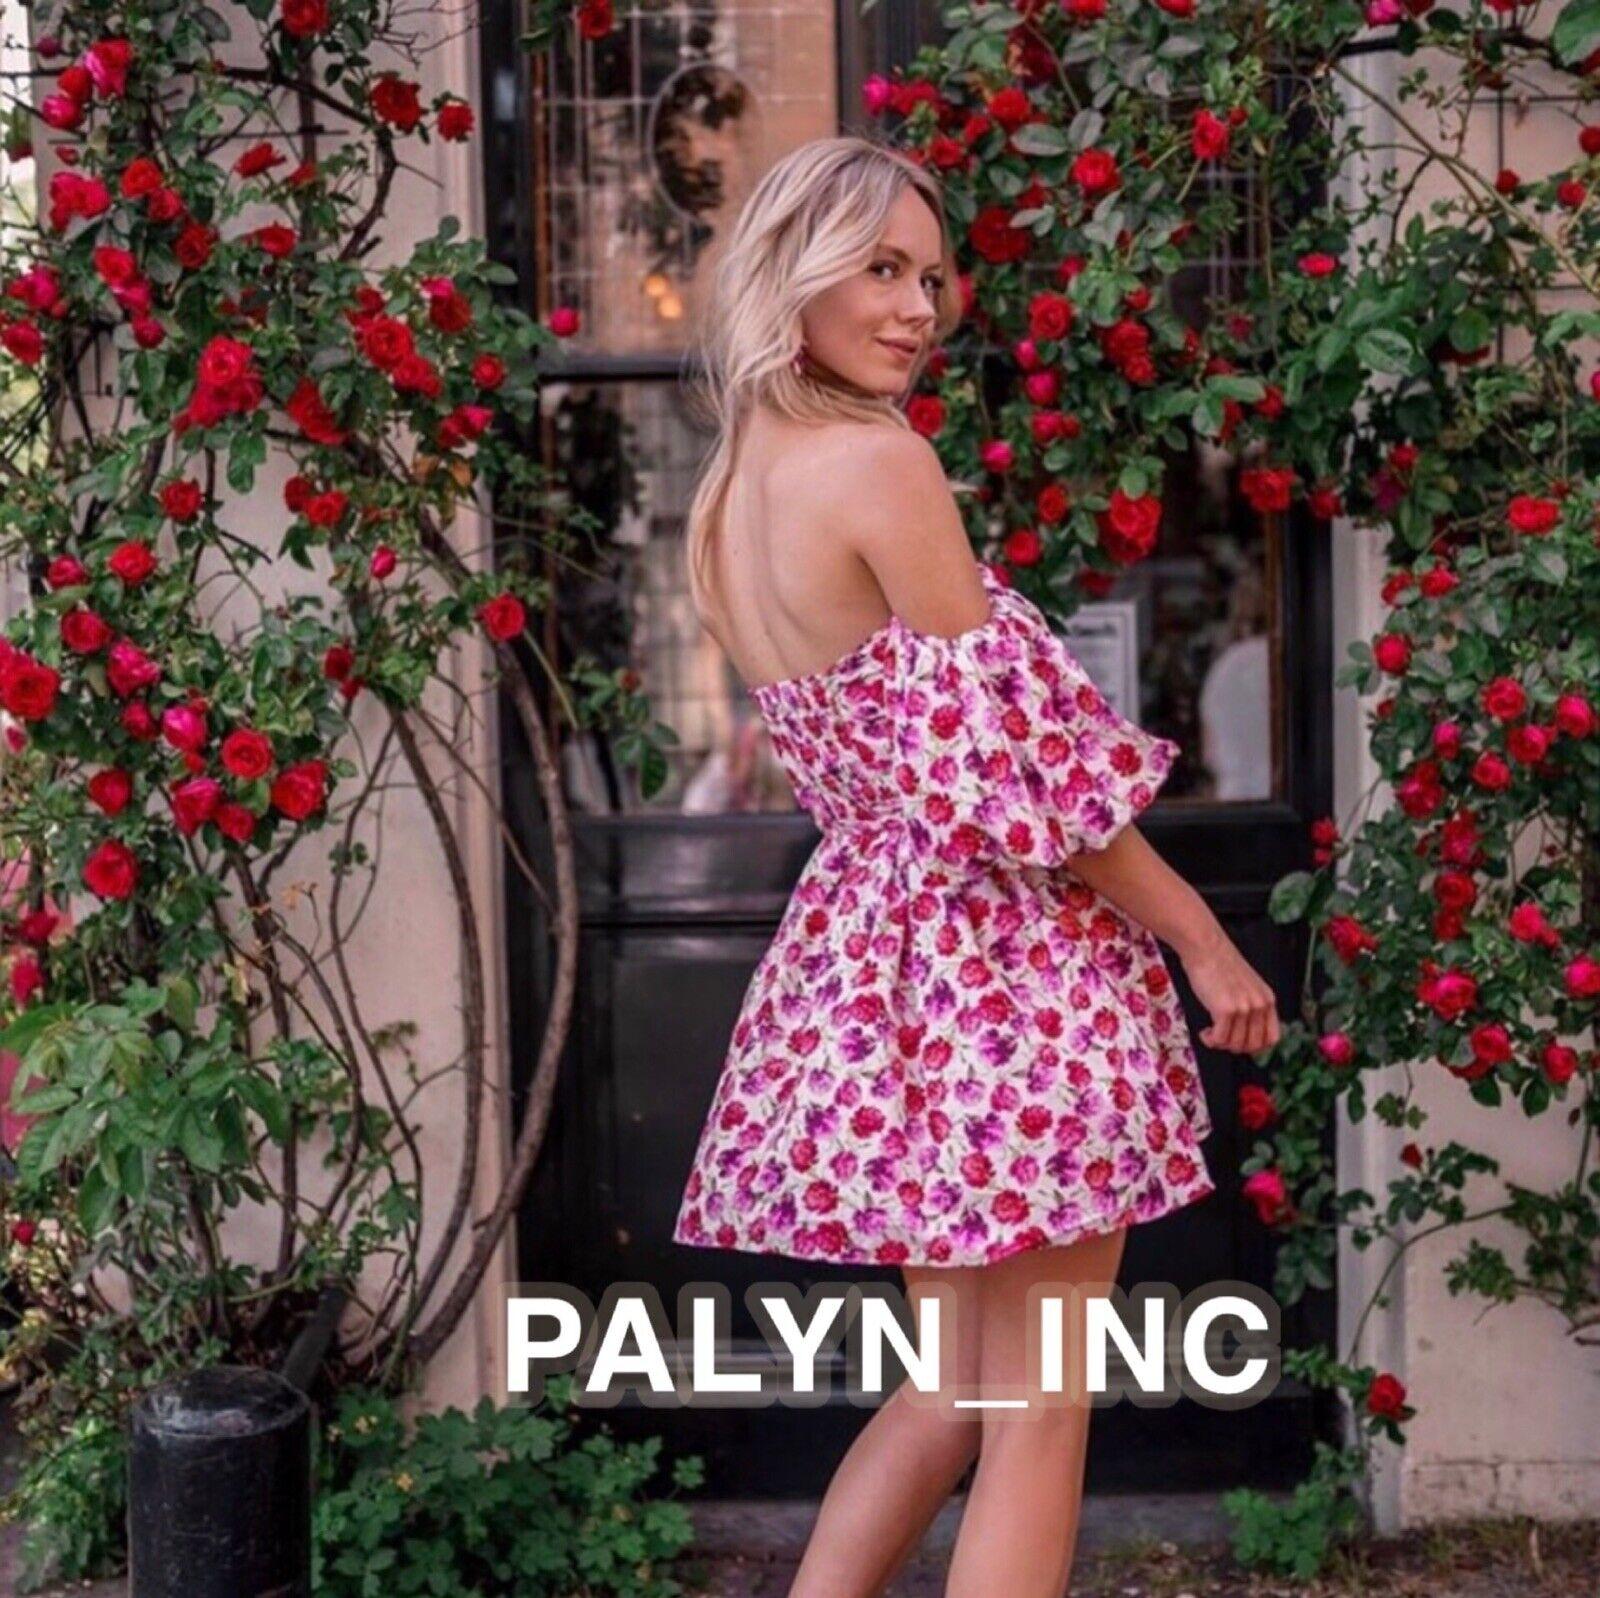 Nwt Zara SS19 Mini Bedrucktes Kleid mit Gürtel Blaumenmuster Puffärmeln_XS-L